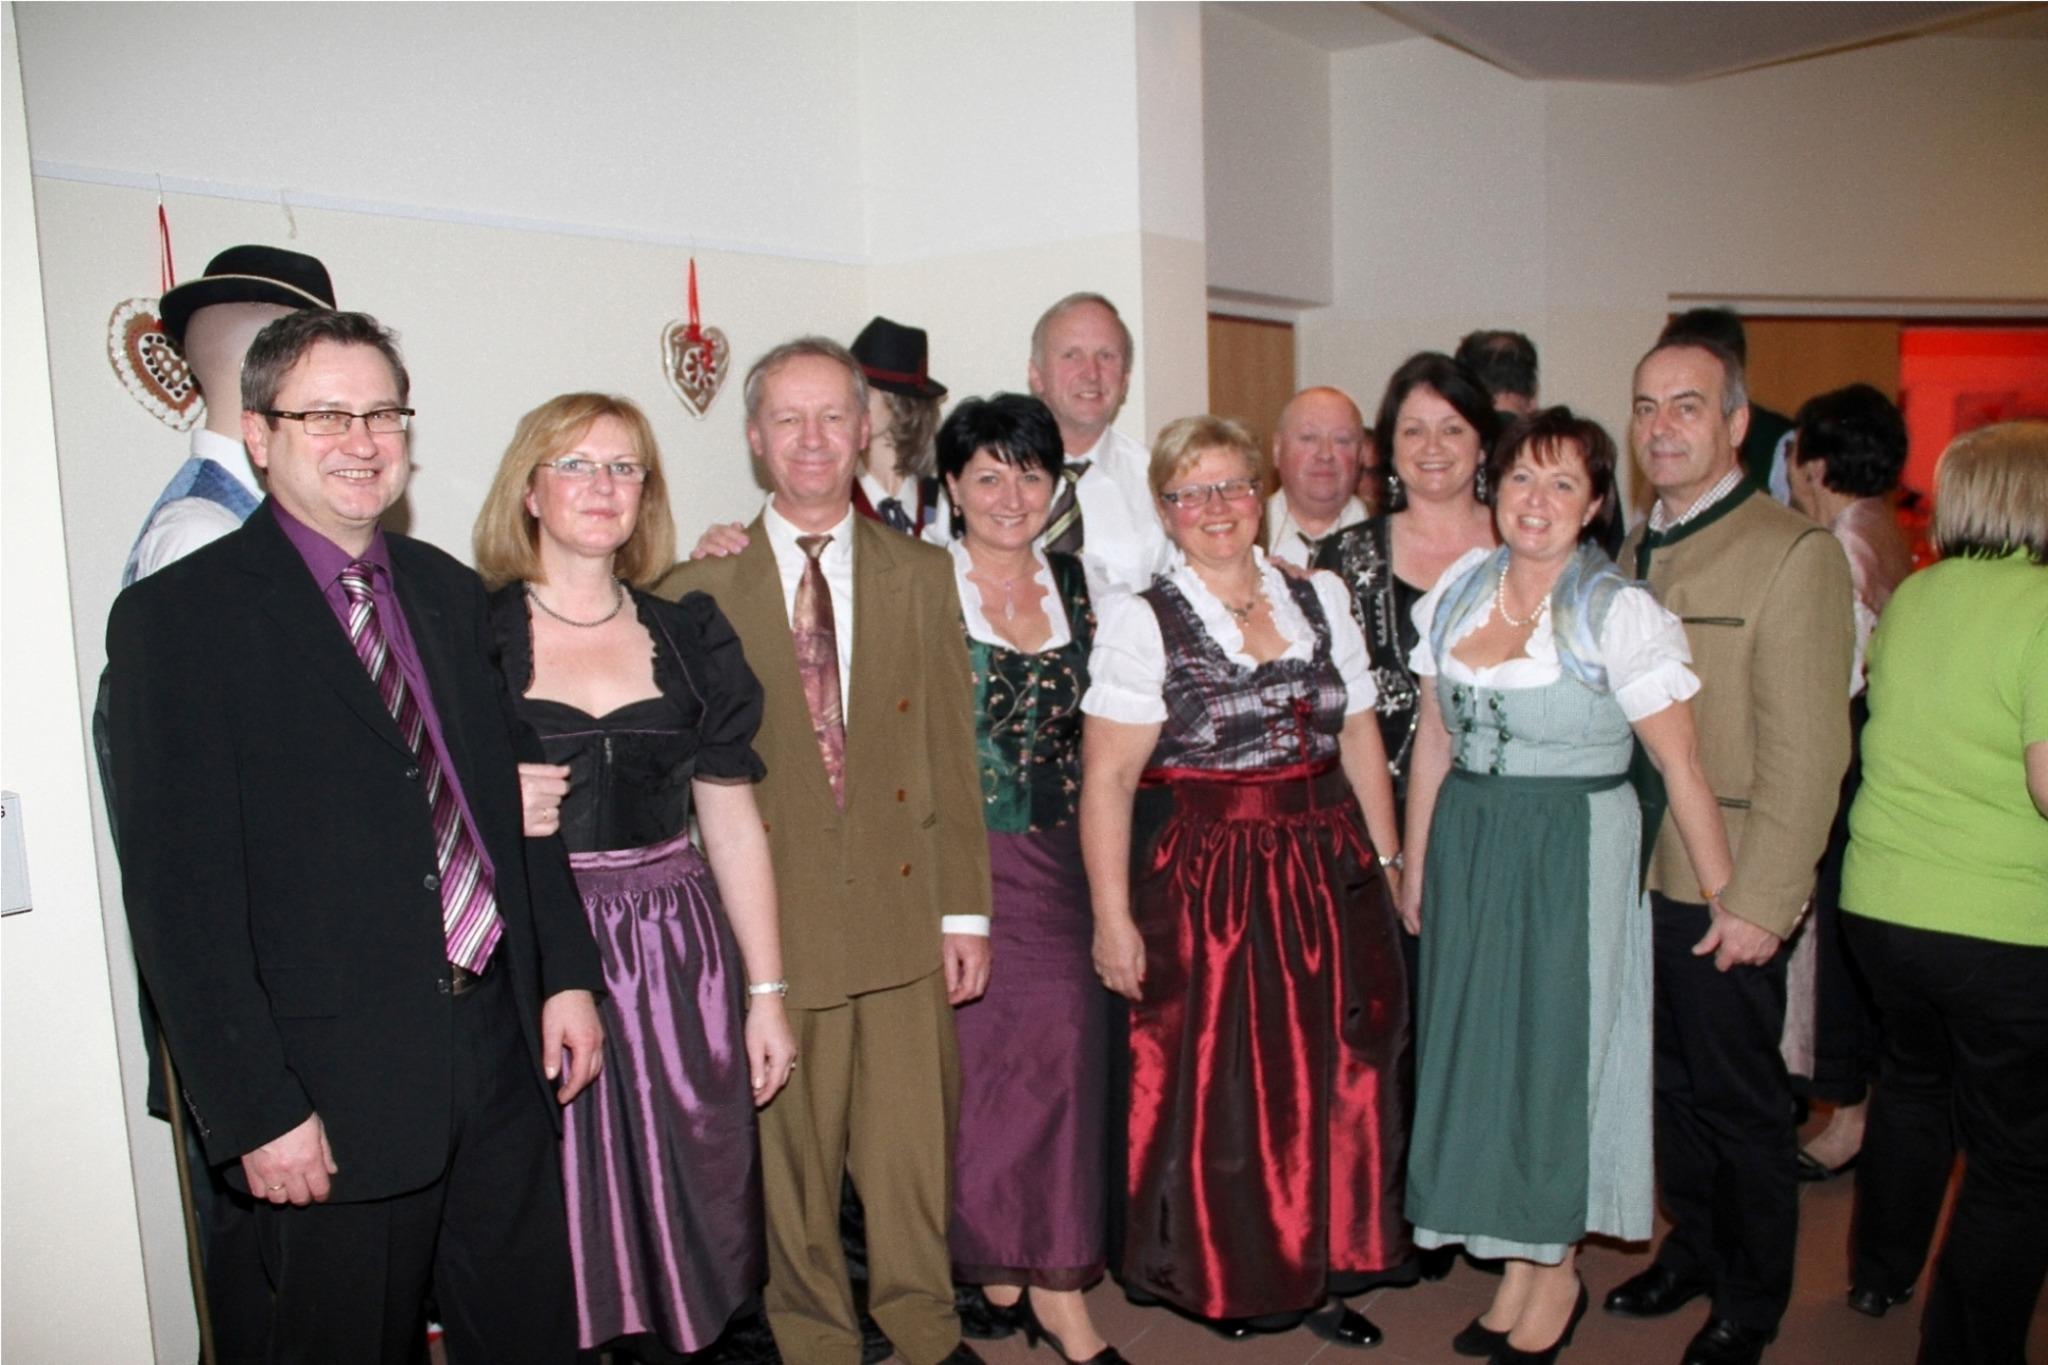 Fieberbrunn single event: Elixhausen single brse